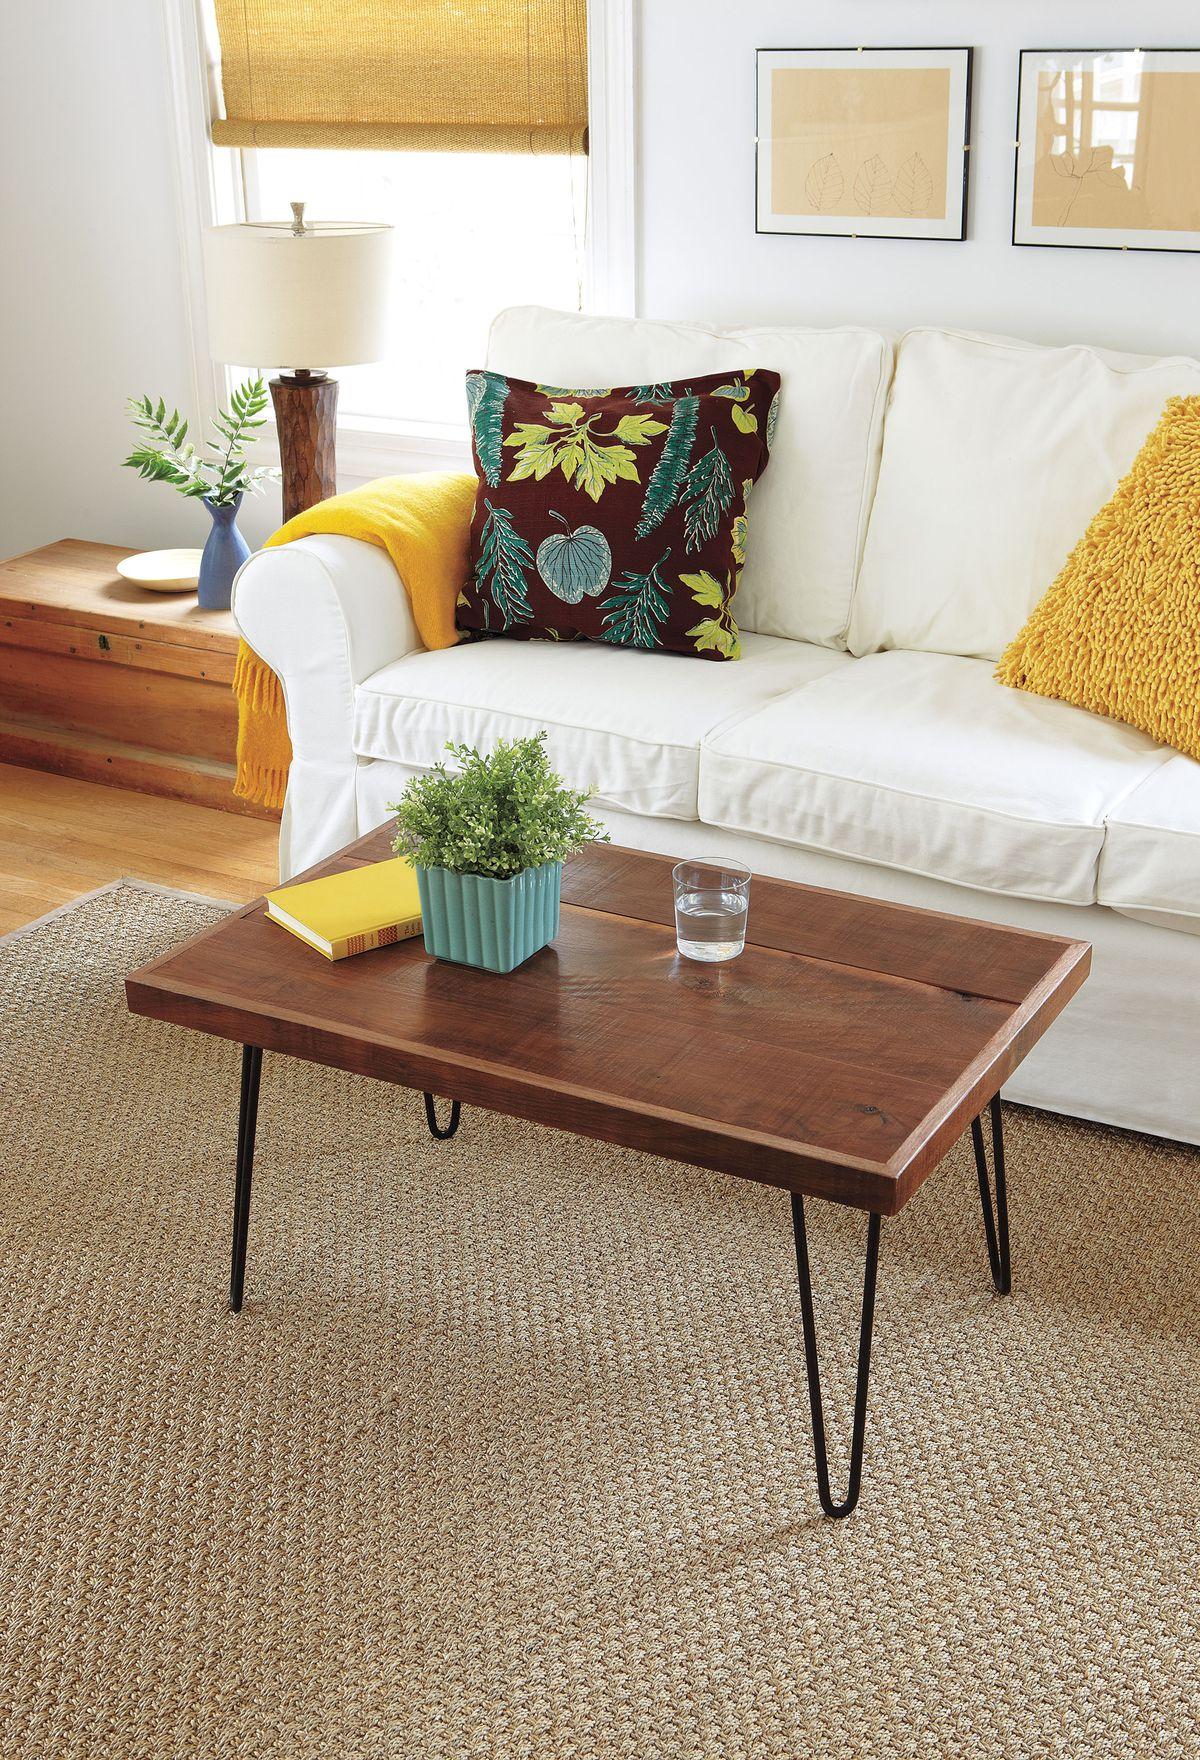 Metal and wood table.